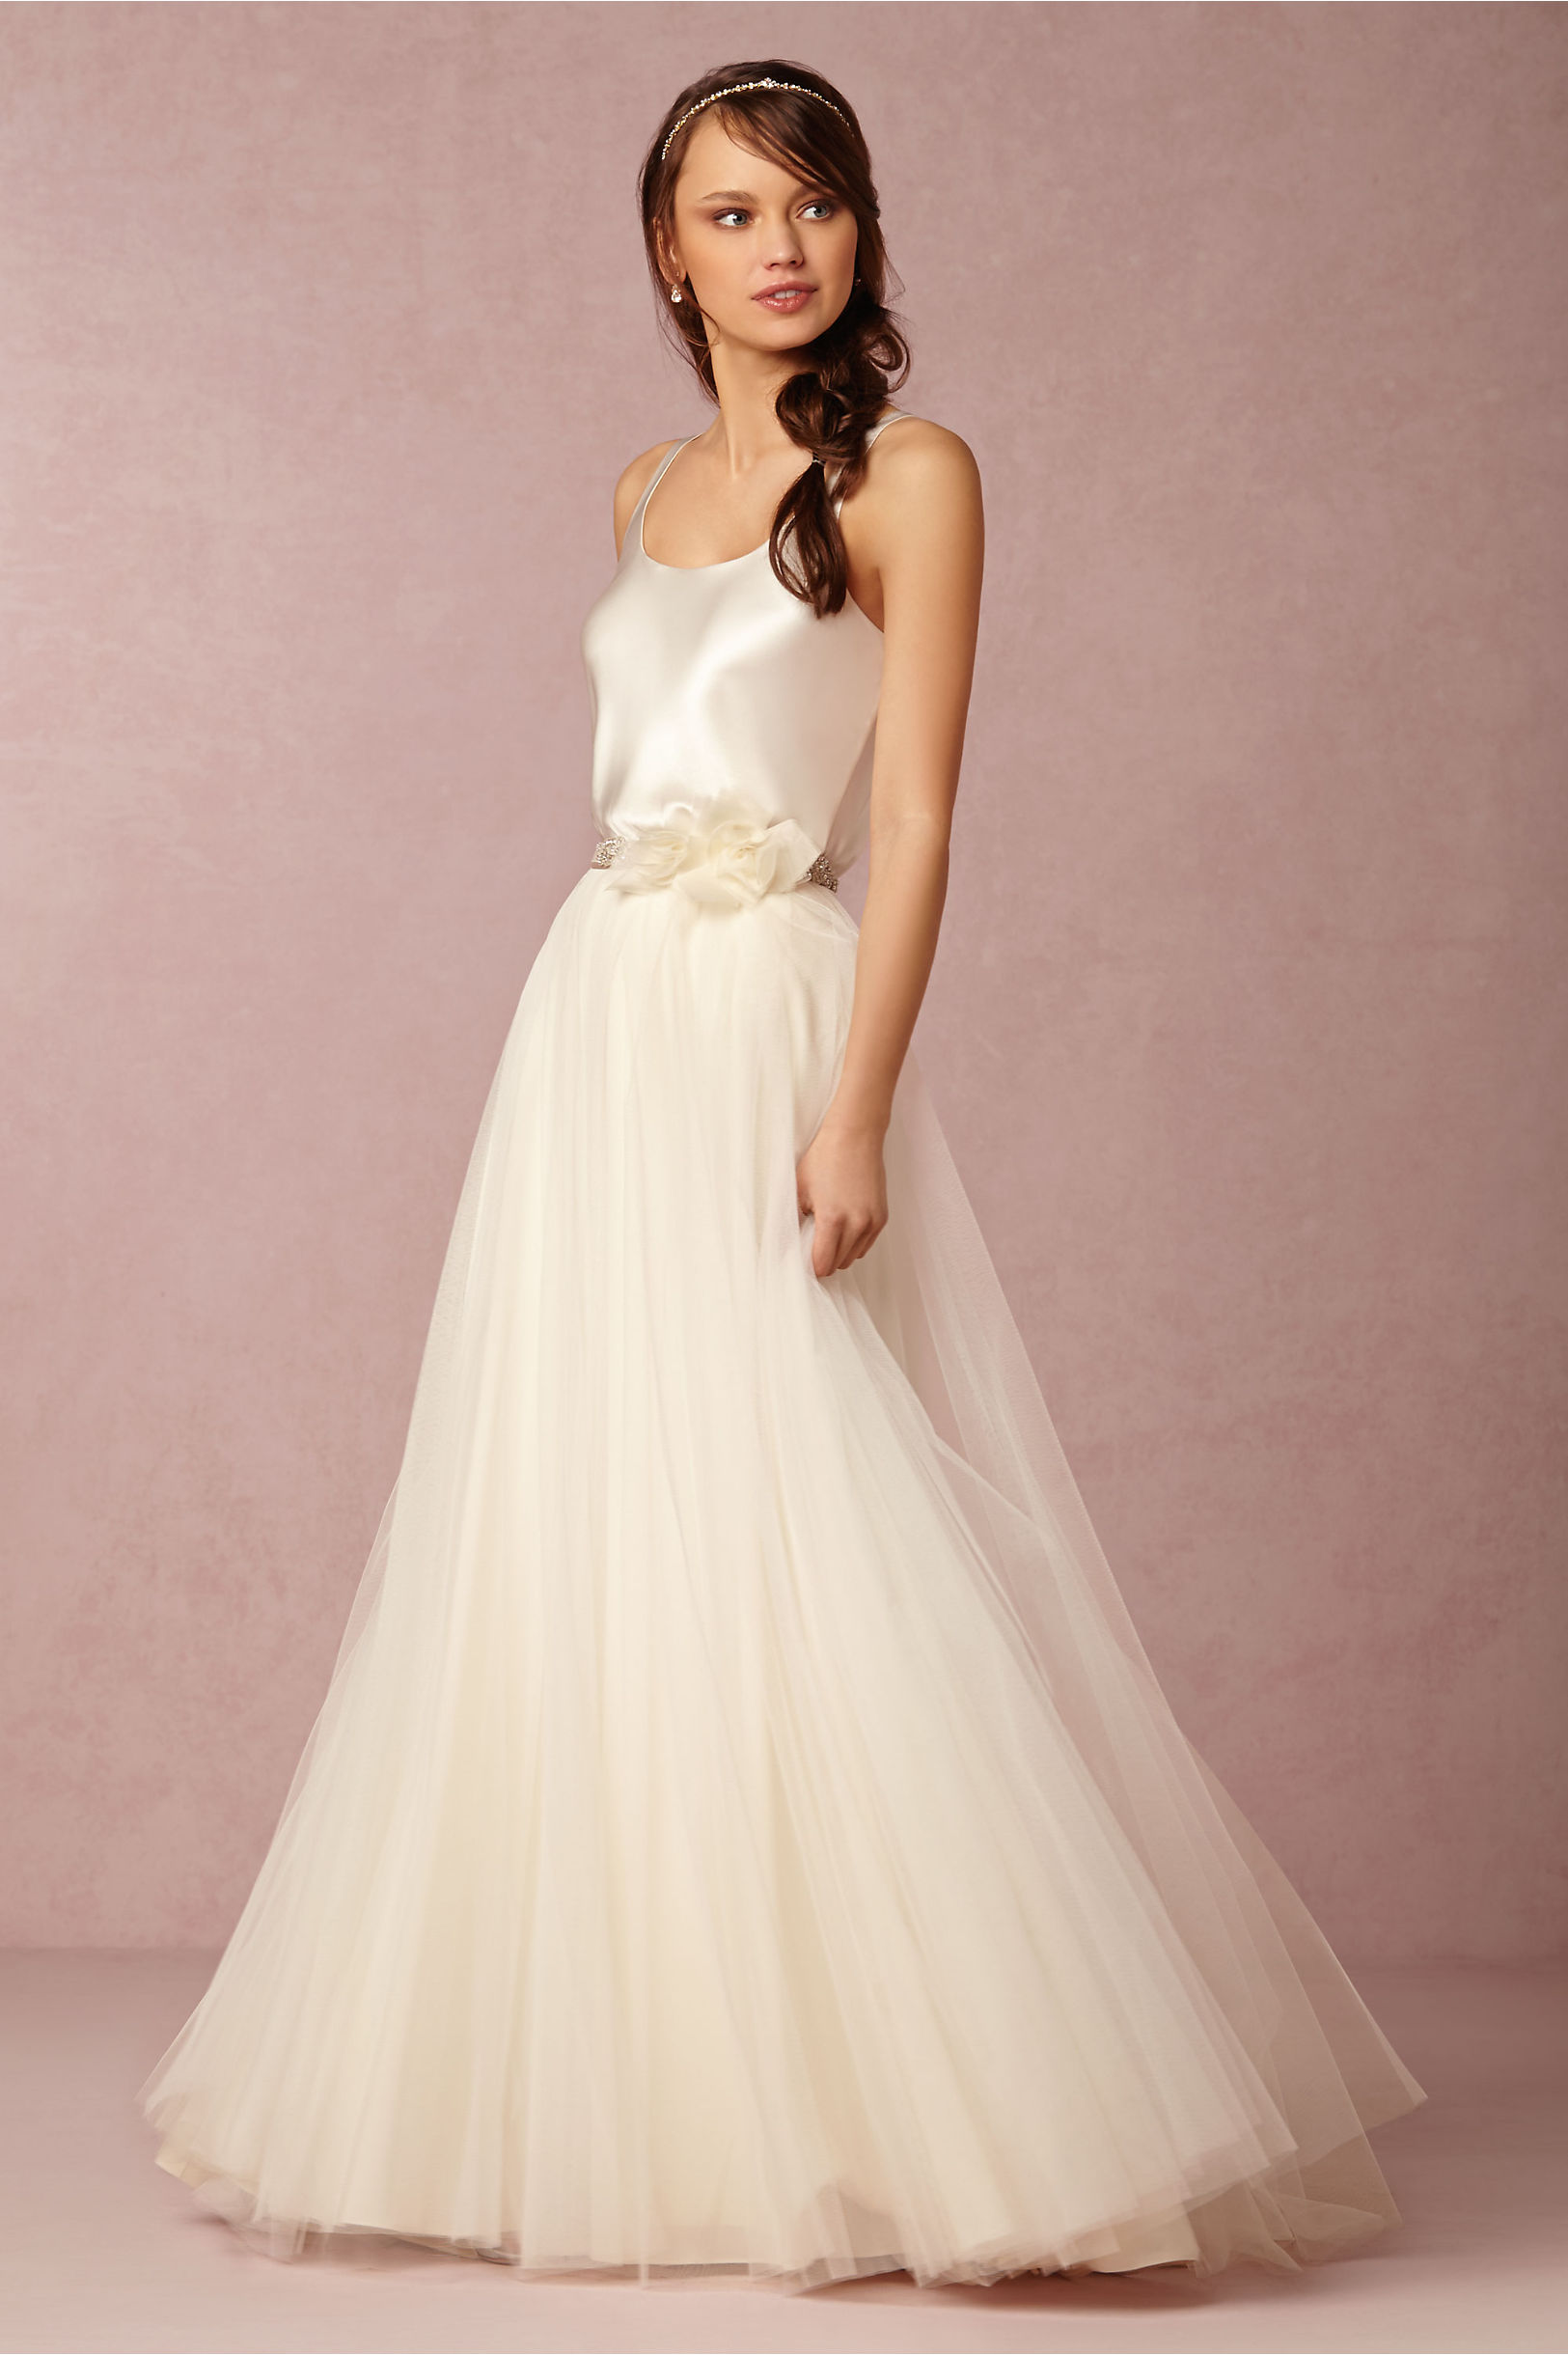 Gracia Skirt & Perpetuity Camisole in Bride | BHLDN